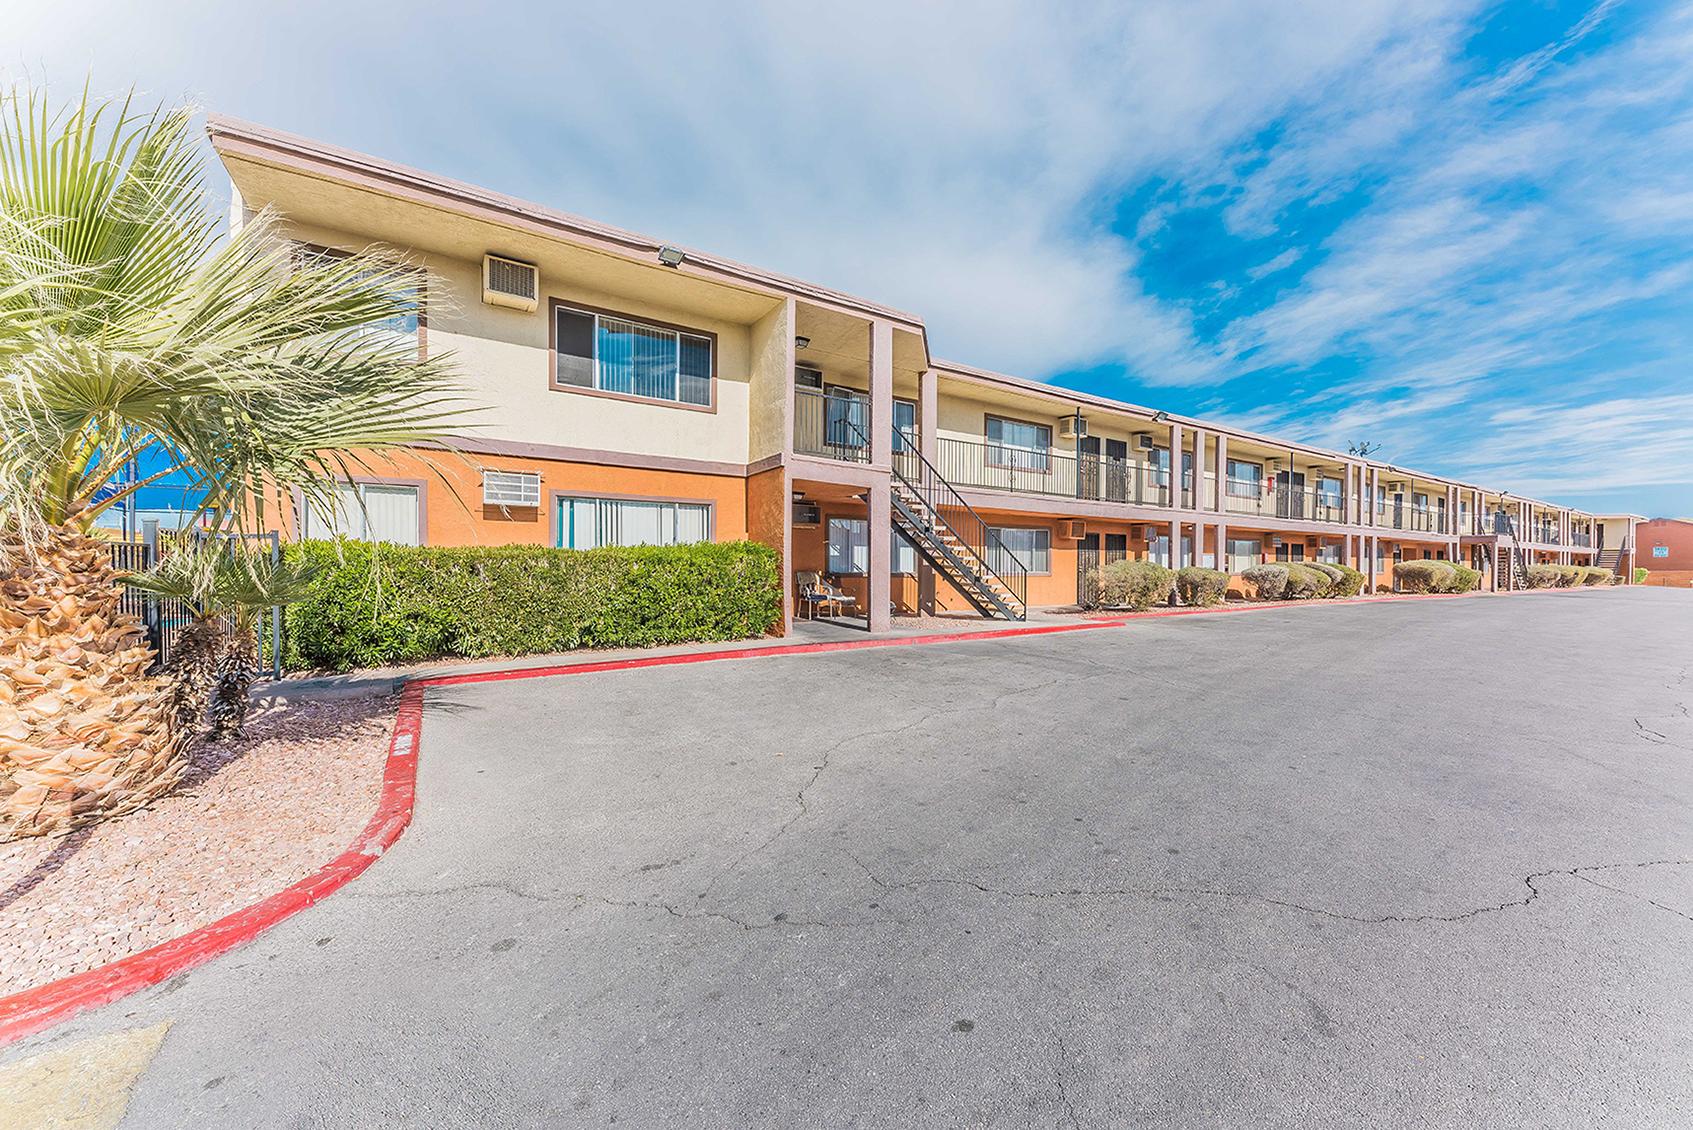 Rancho Alvarado Apartments for rent